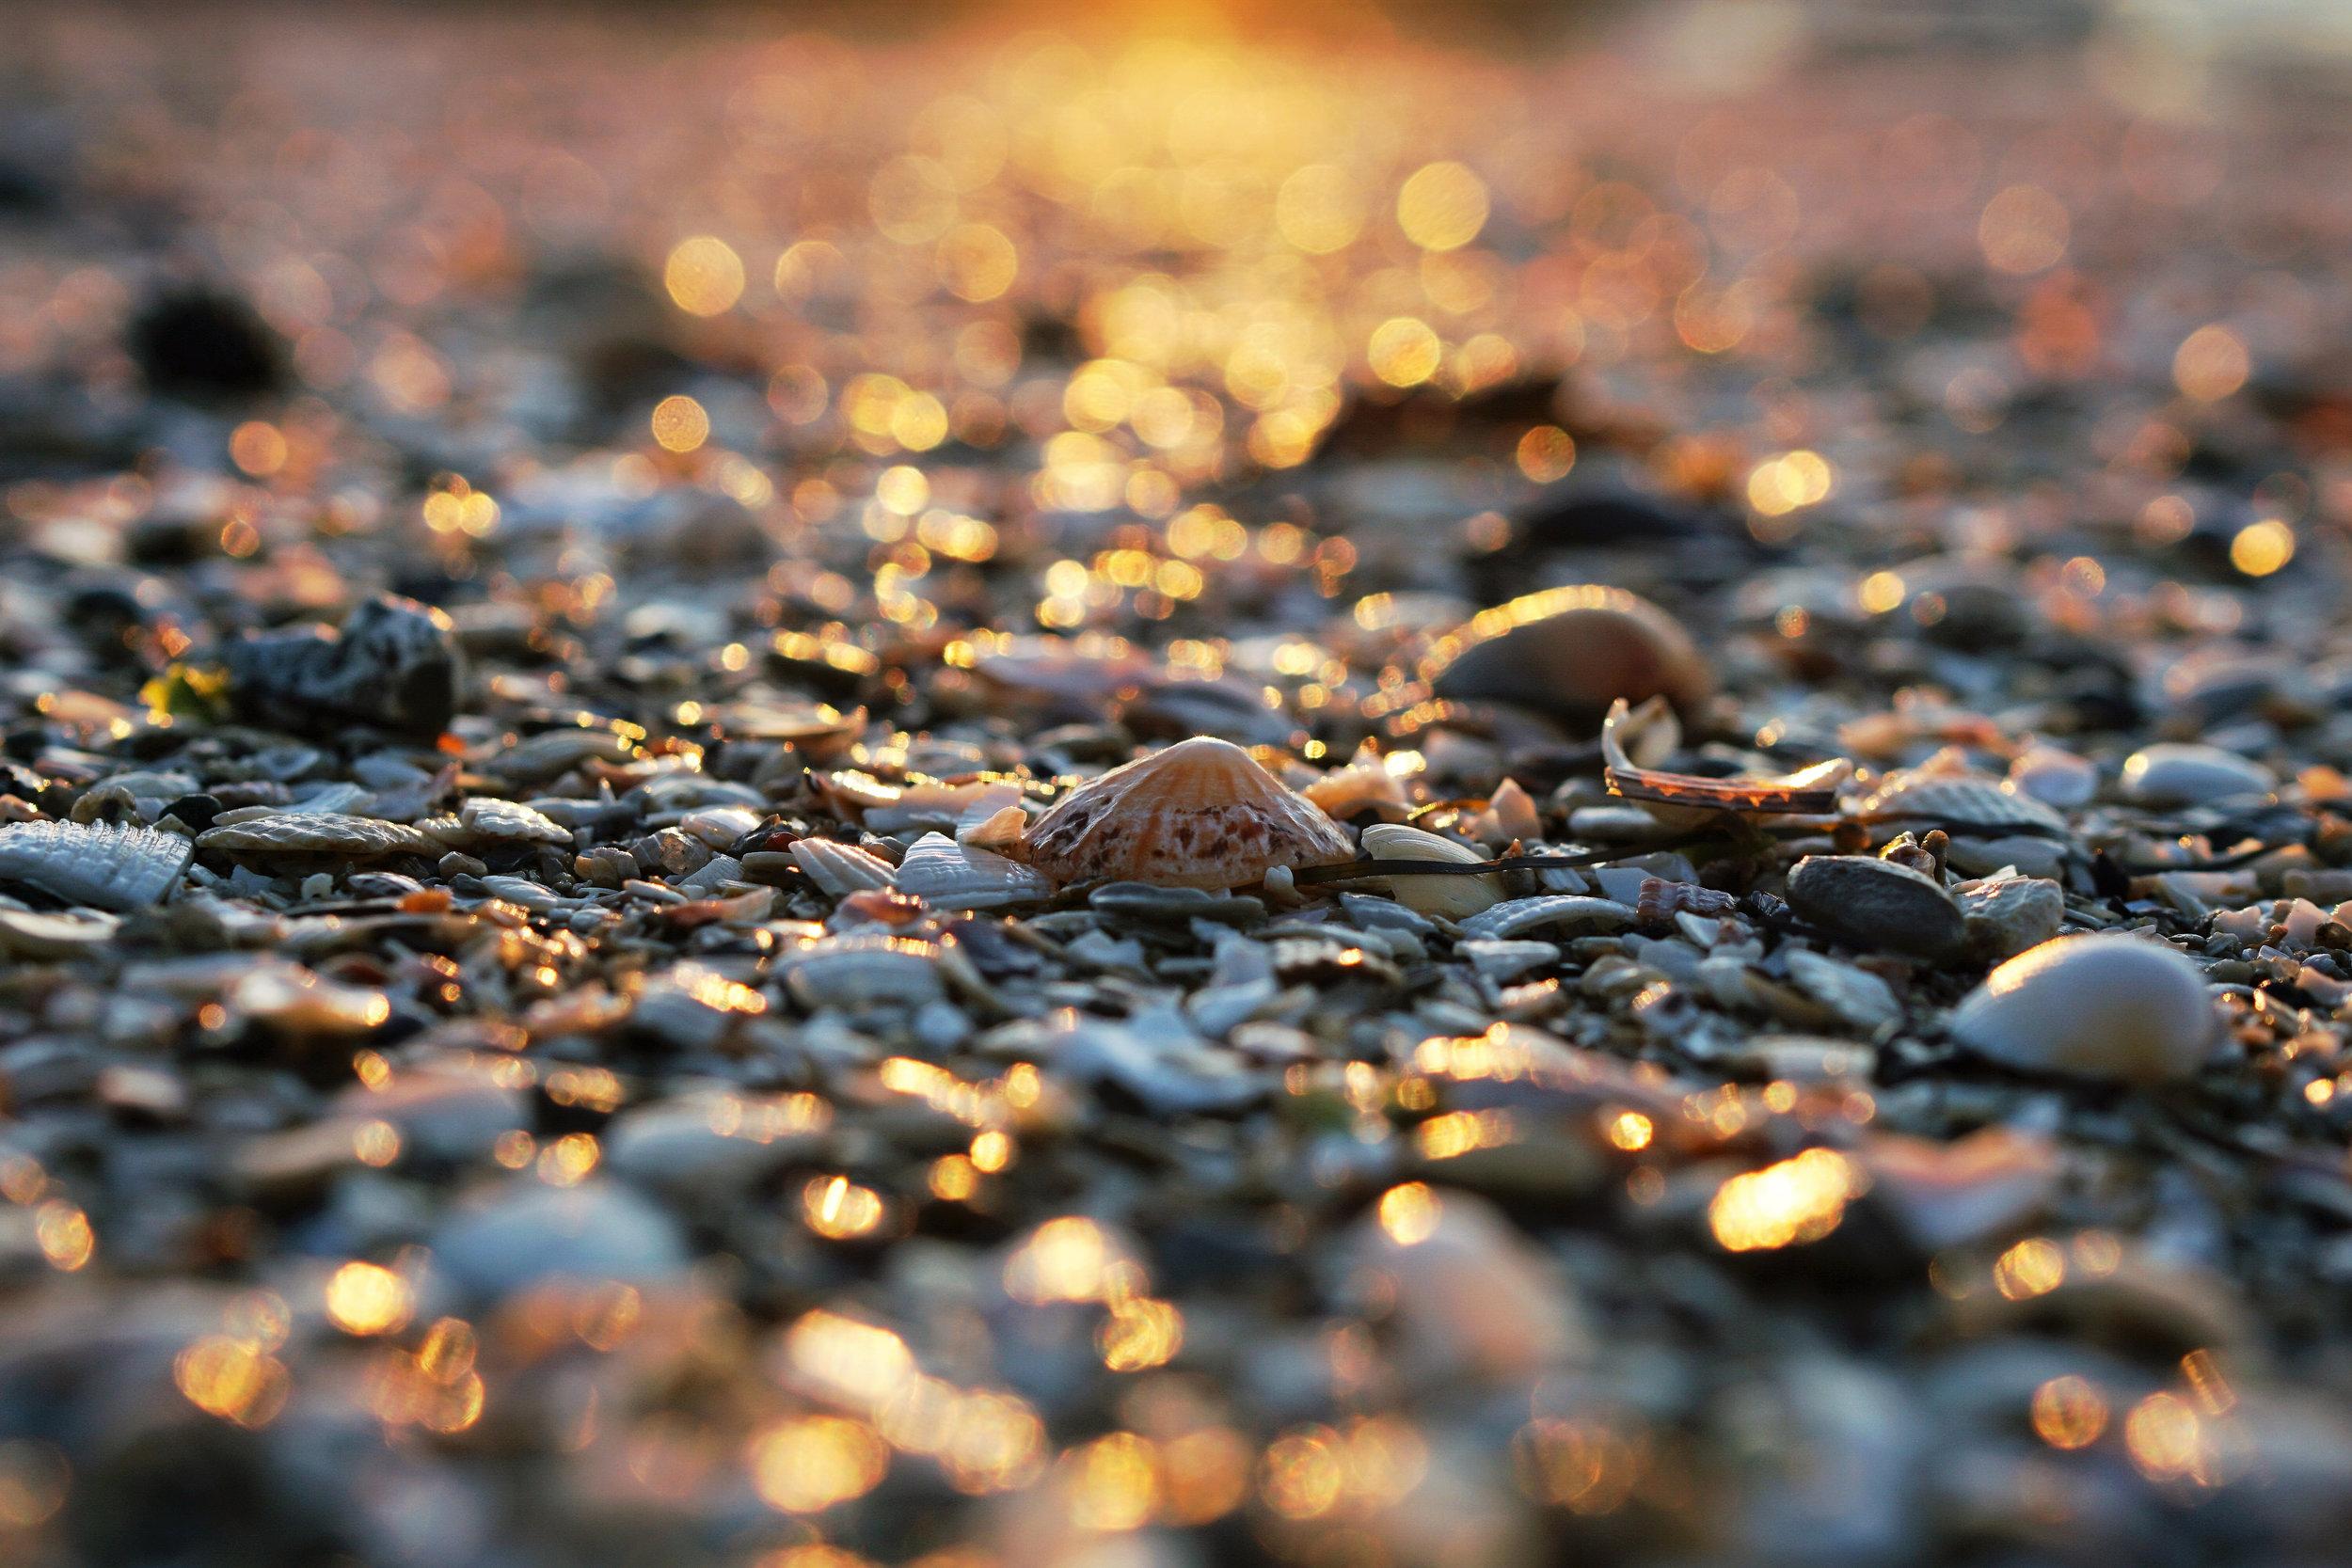 landscape-shells close up sun reflecting--erwan-hesry-42660.jpg